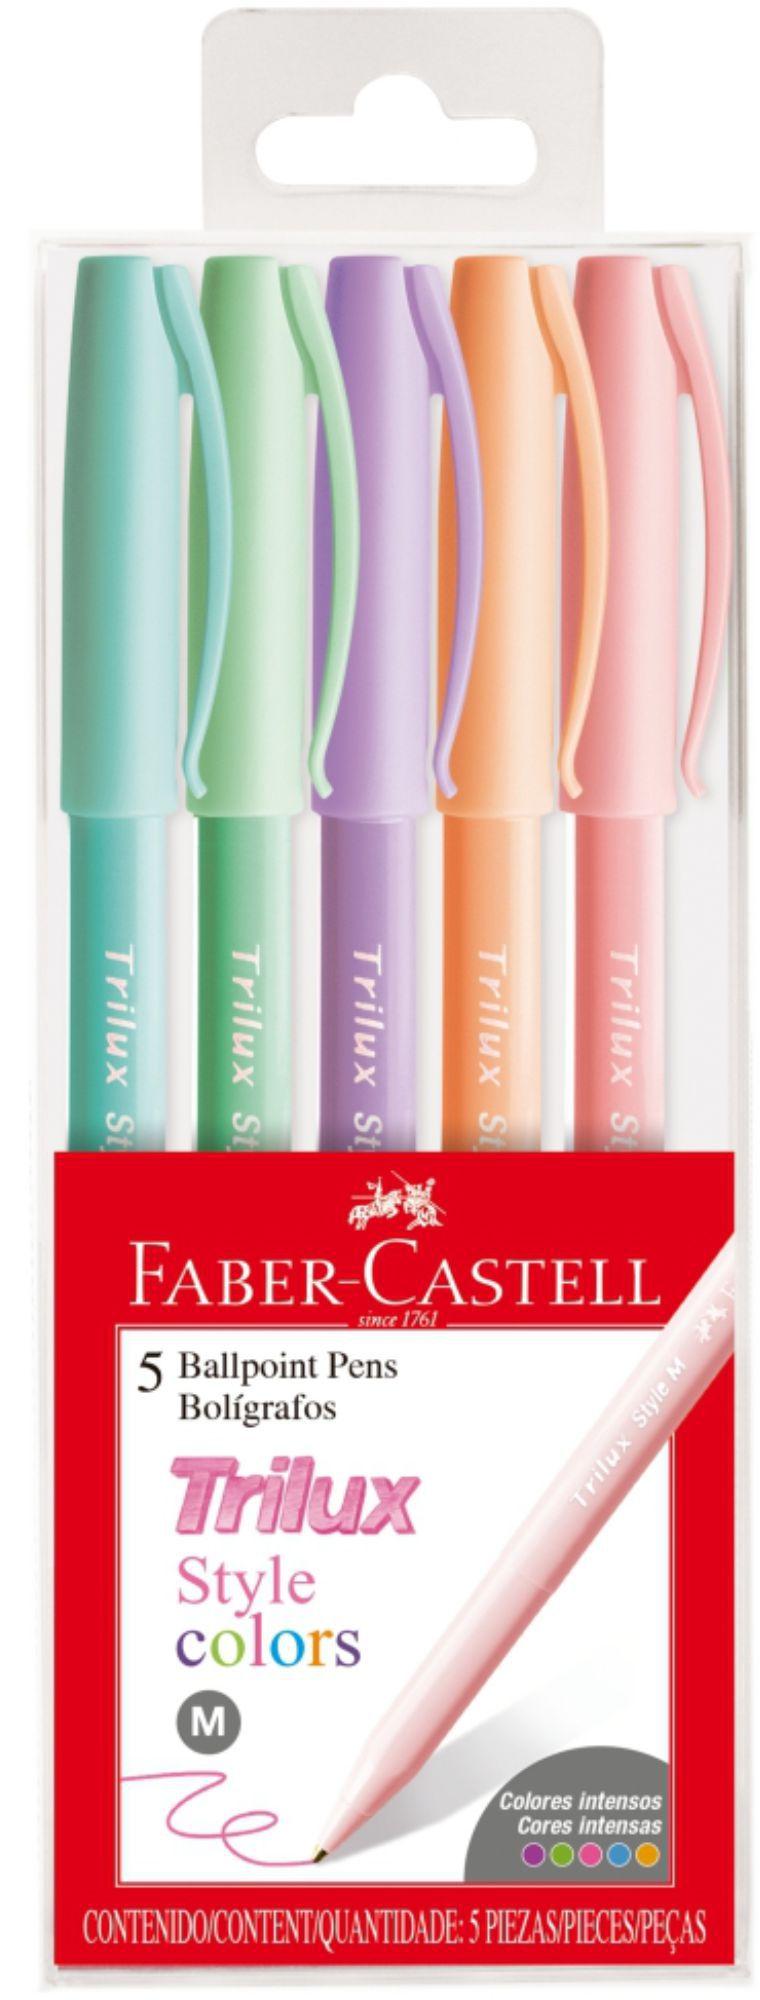 Caneta Trilux Faber Castell Pastel 5 Cores